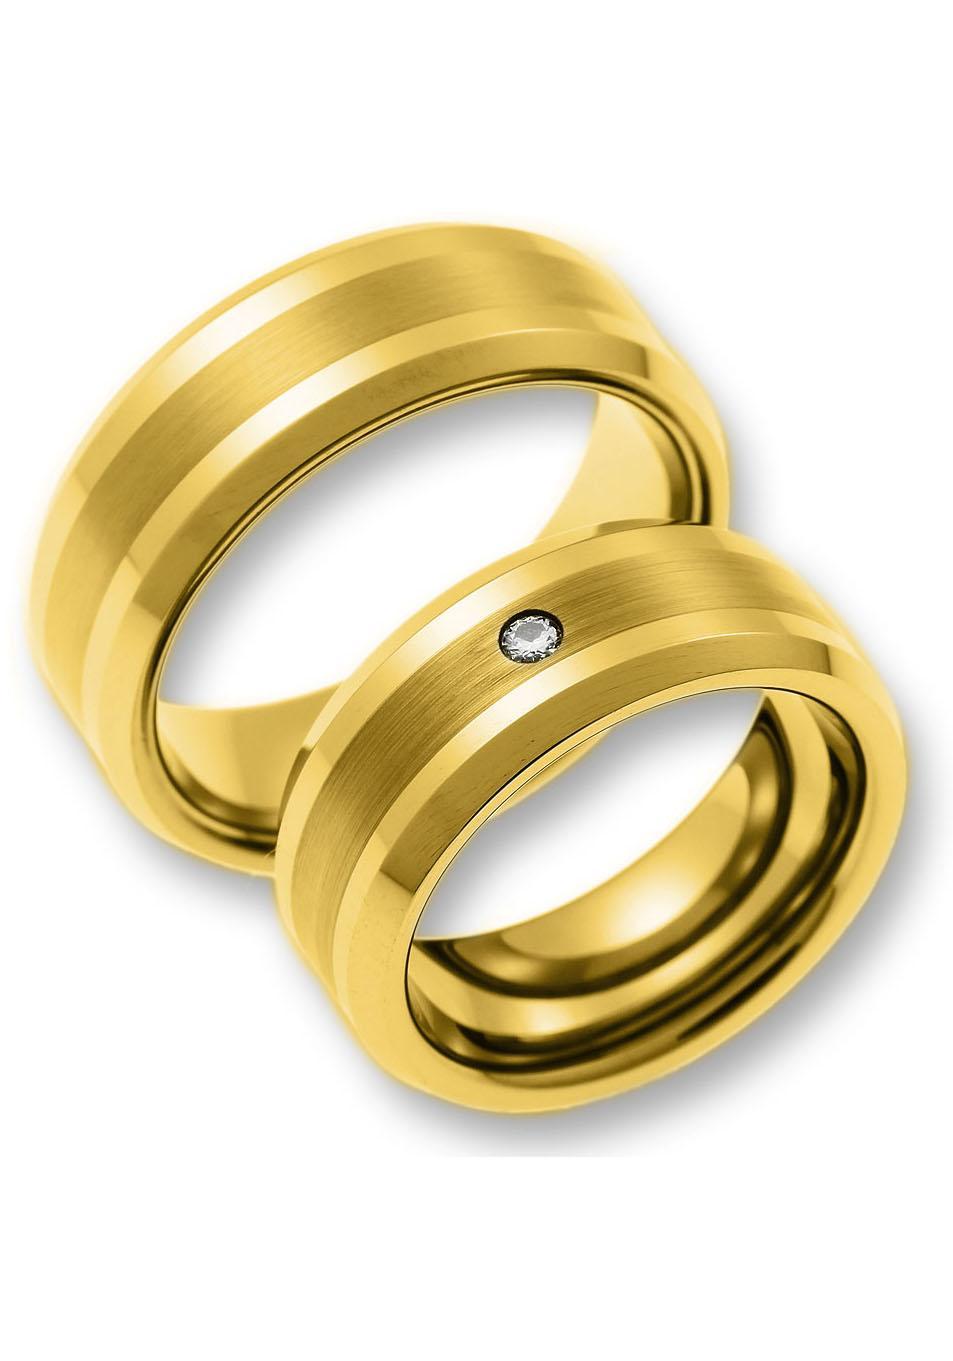 CORE by Schumann Design Partnerring »TW012.10/19013846, TW012.03/10008962« | Schmuck > Ringe > Partnerringe | Goldfarben | CORE BY SCHUMANN DESIGN